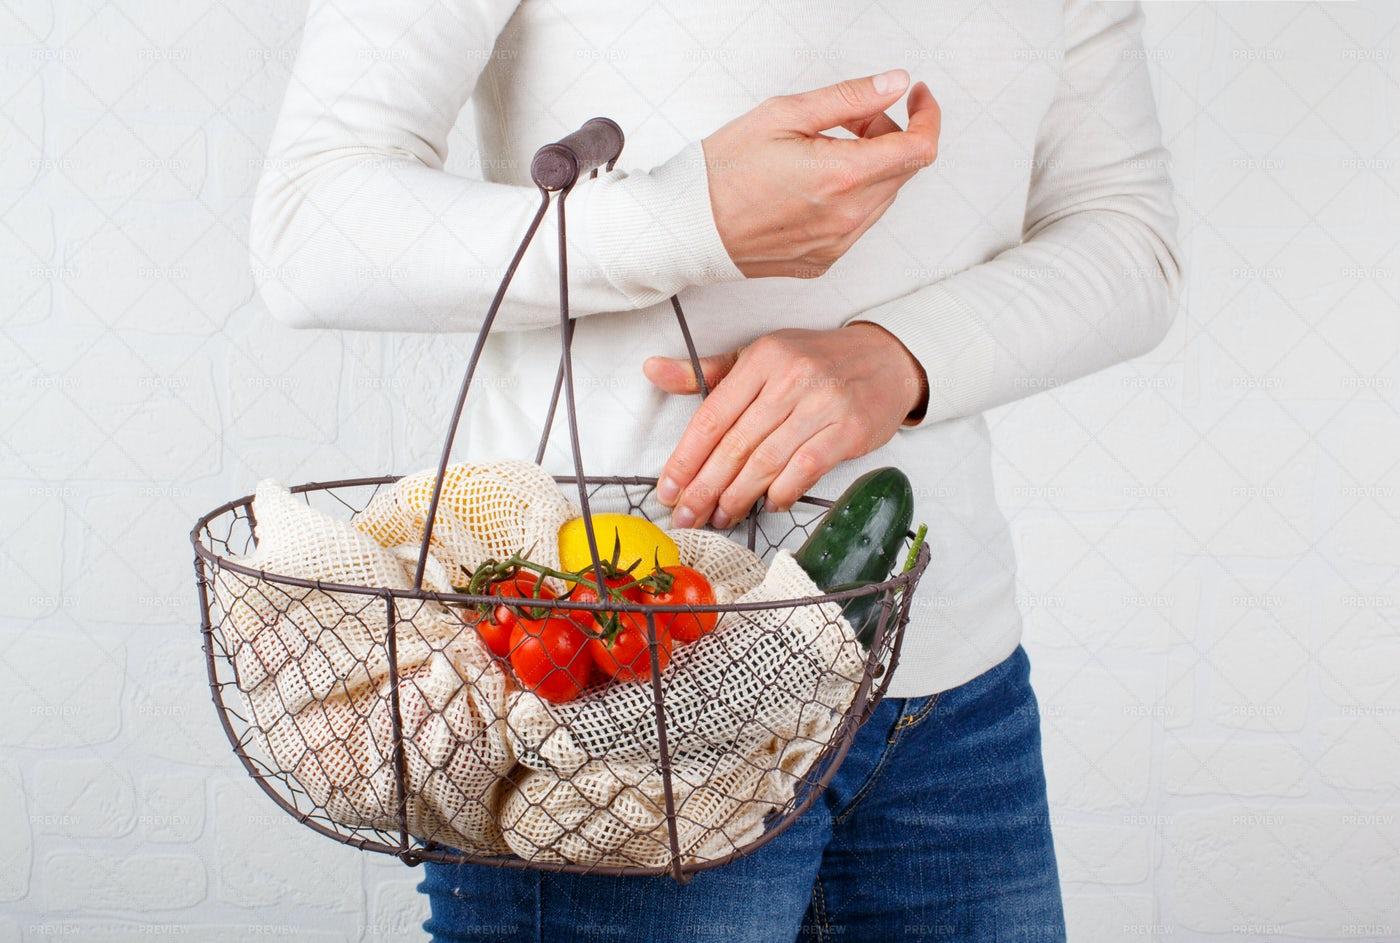 Reaching Into The Basket: Stock Photos